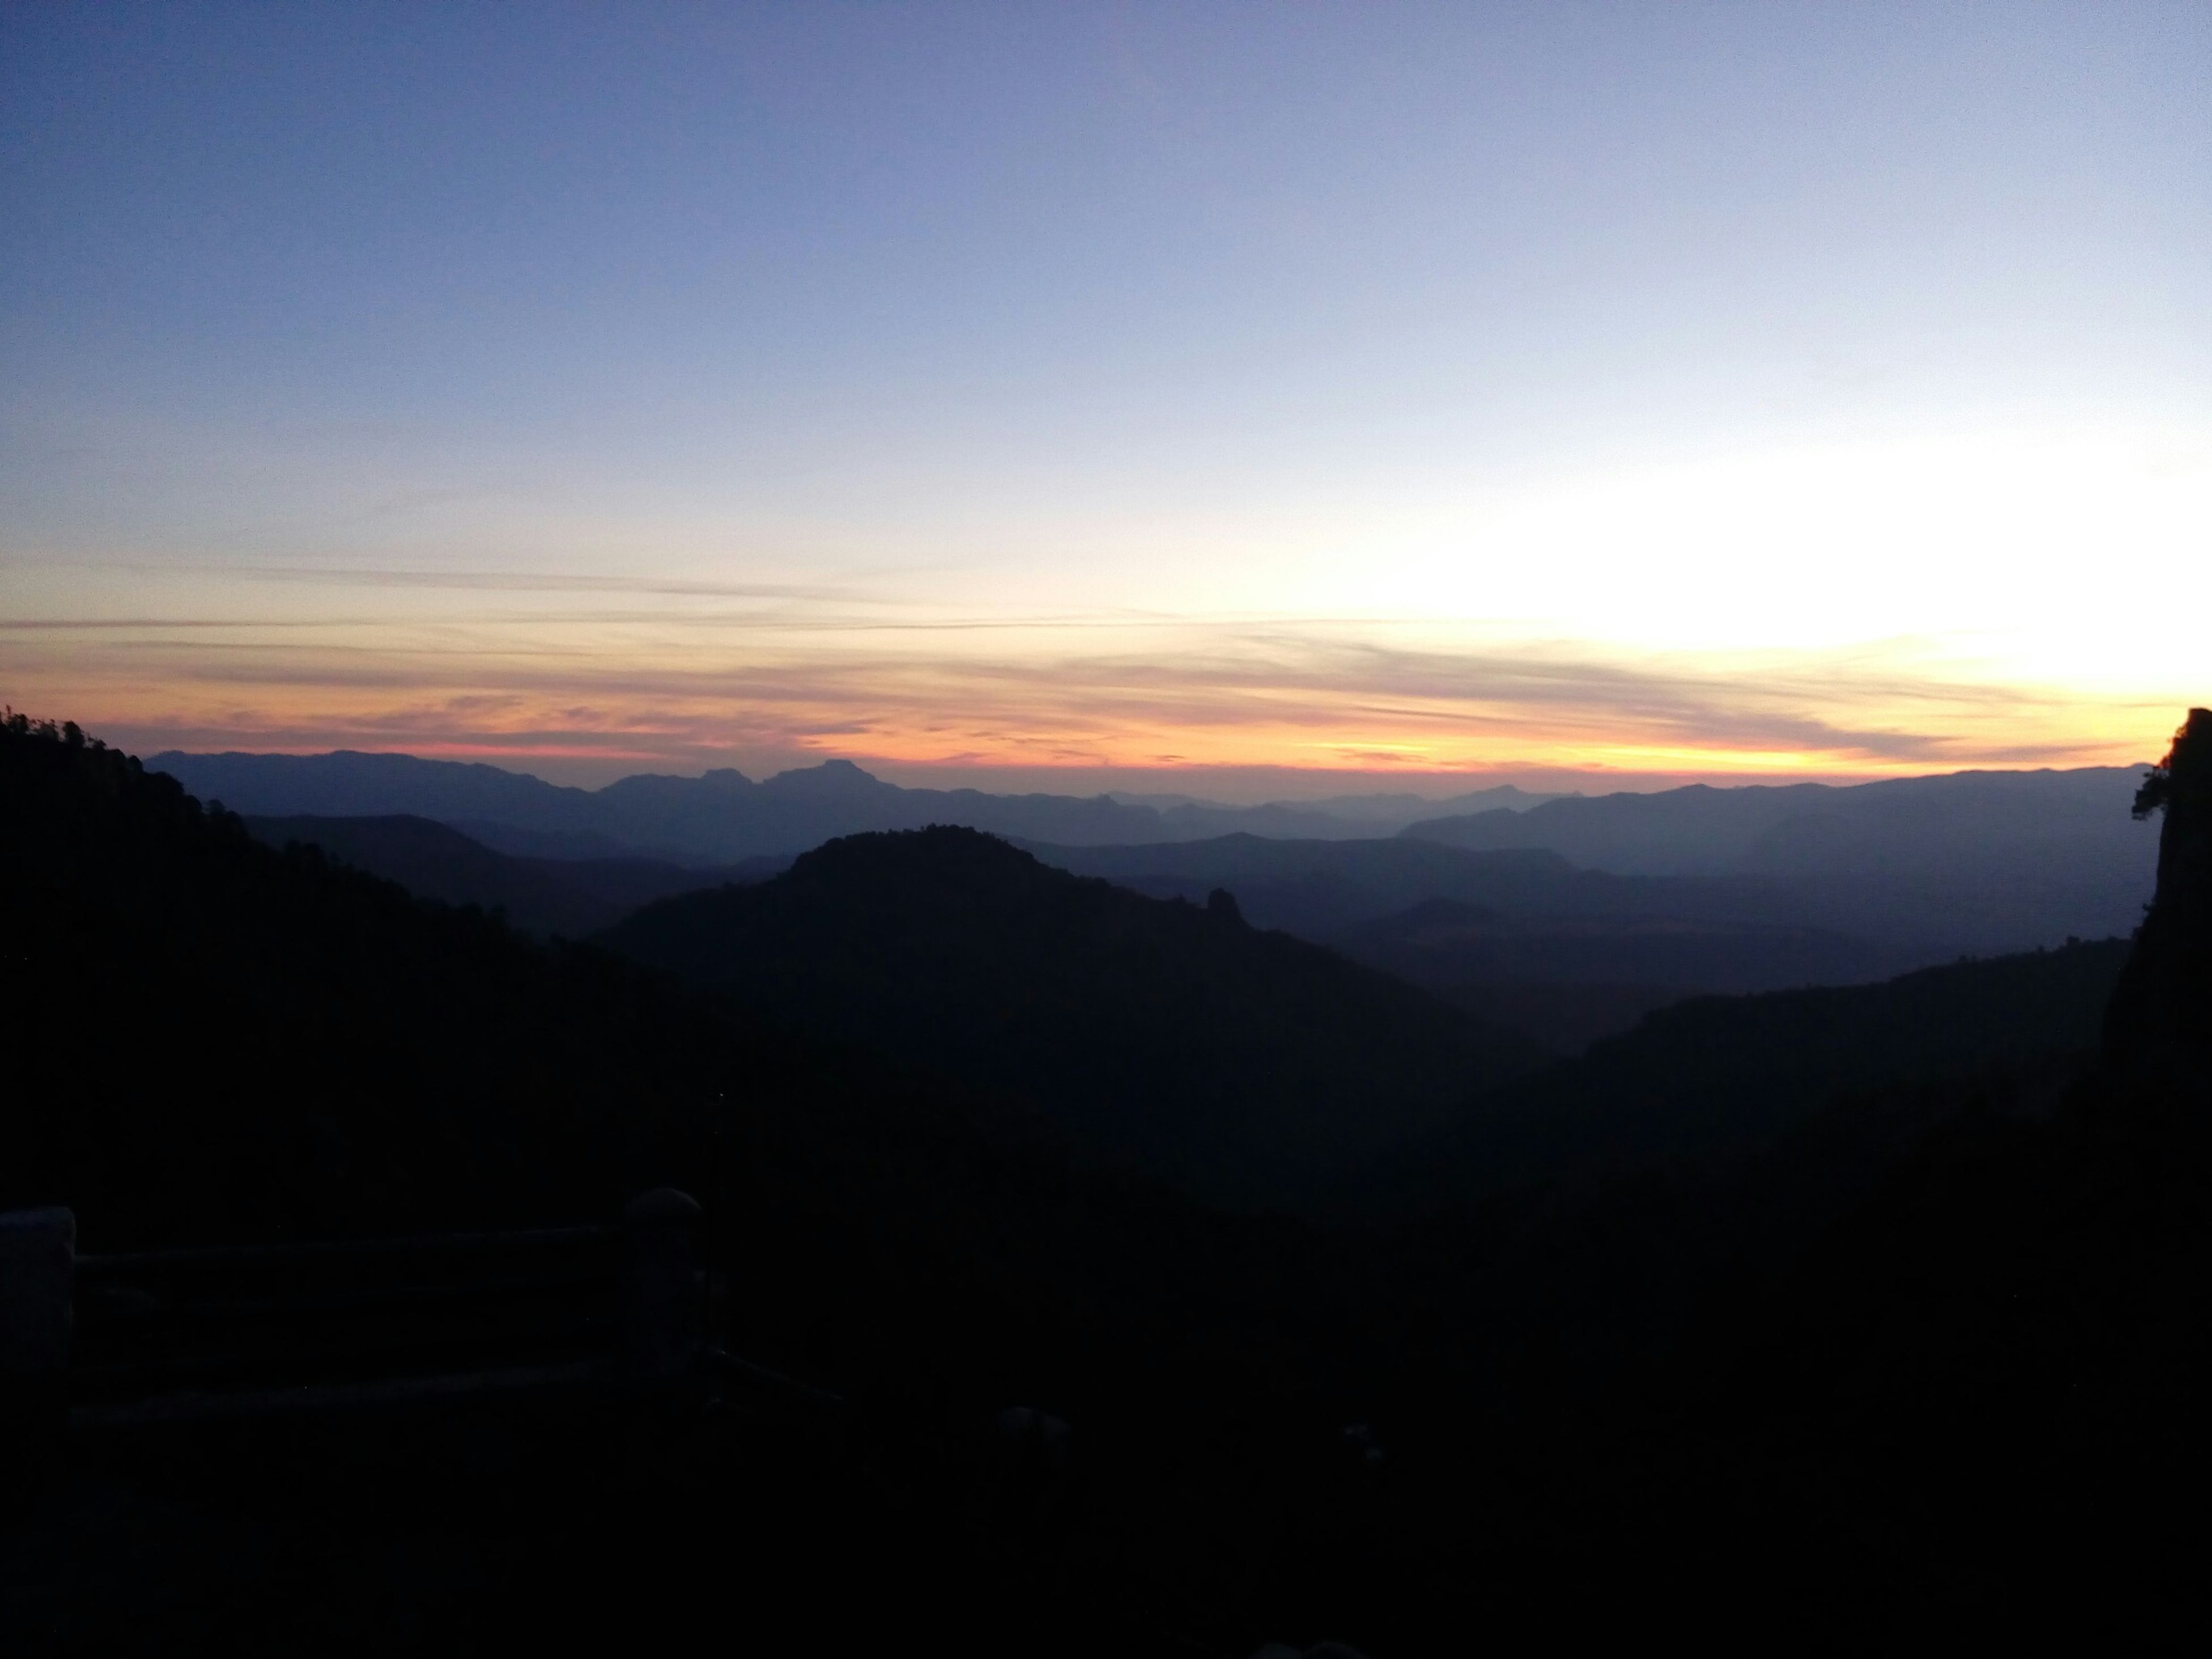 sunset, silhouette, mountain, scenics, tranquil scene, tranquility, mountain range, beauty in nature, sky, landscape, orange color, idyllic, nature, dusk, copy space, dark, non-urban scene, majestic, outline, outdoors